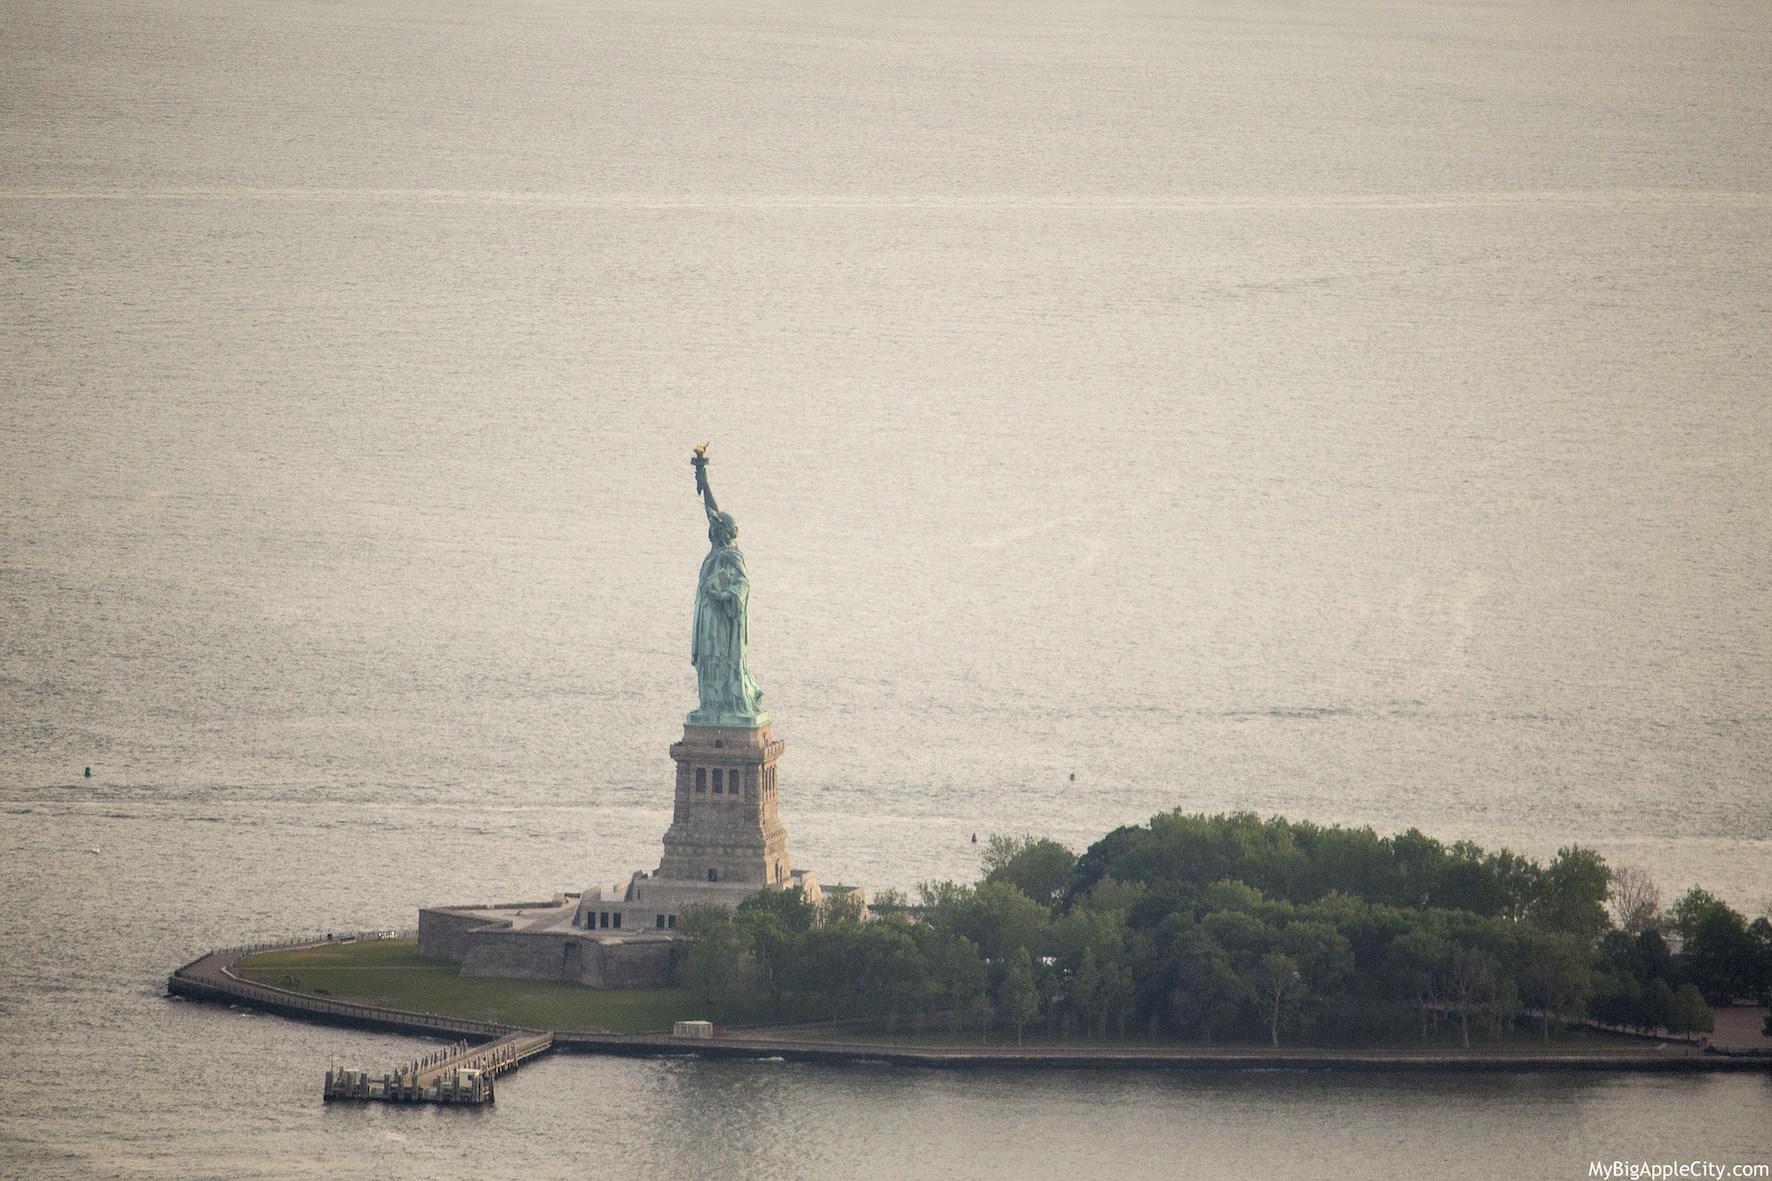 Liberty-Island-One-WTC-visit-New-York-MyBigAppleCity